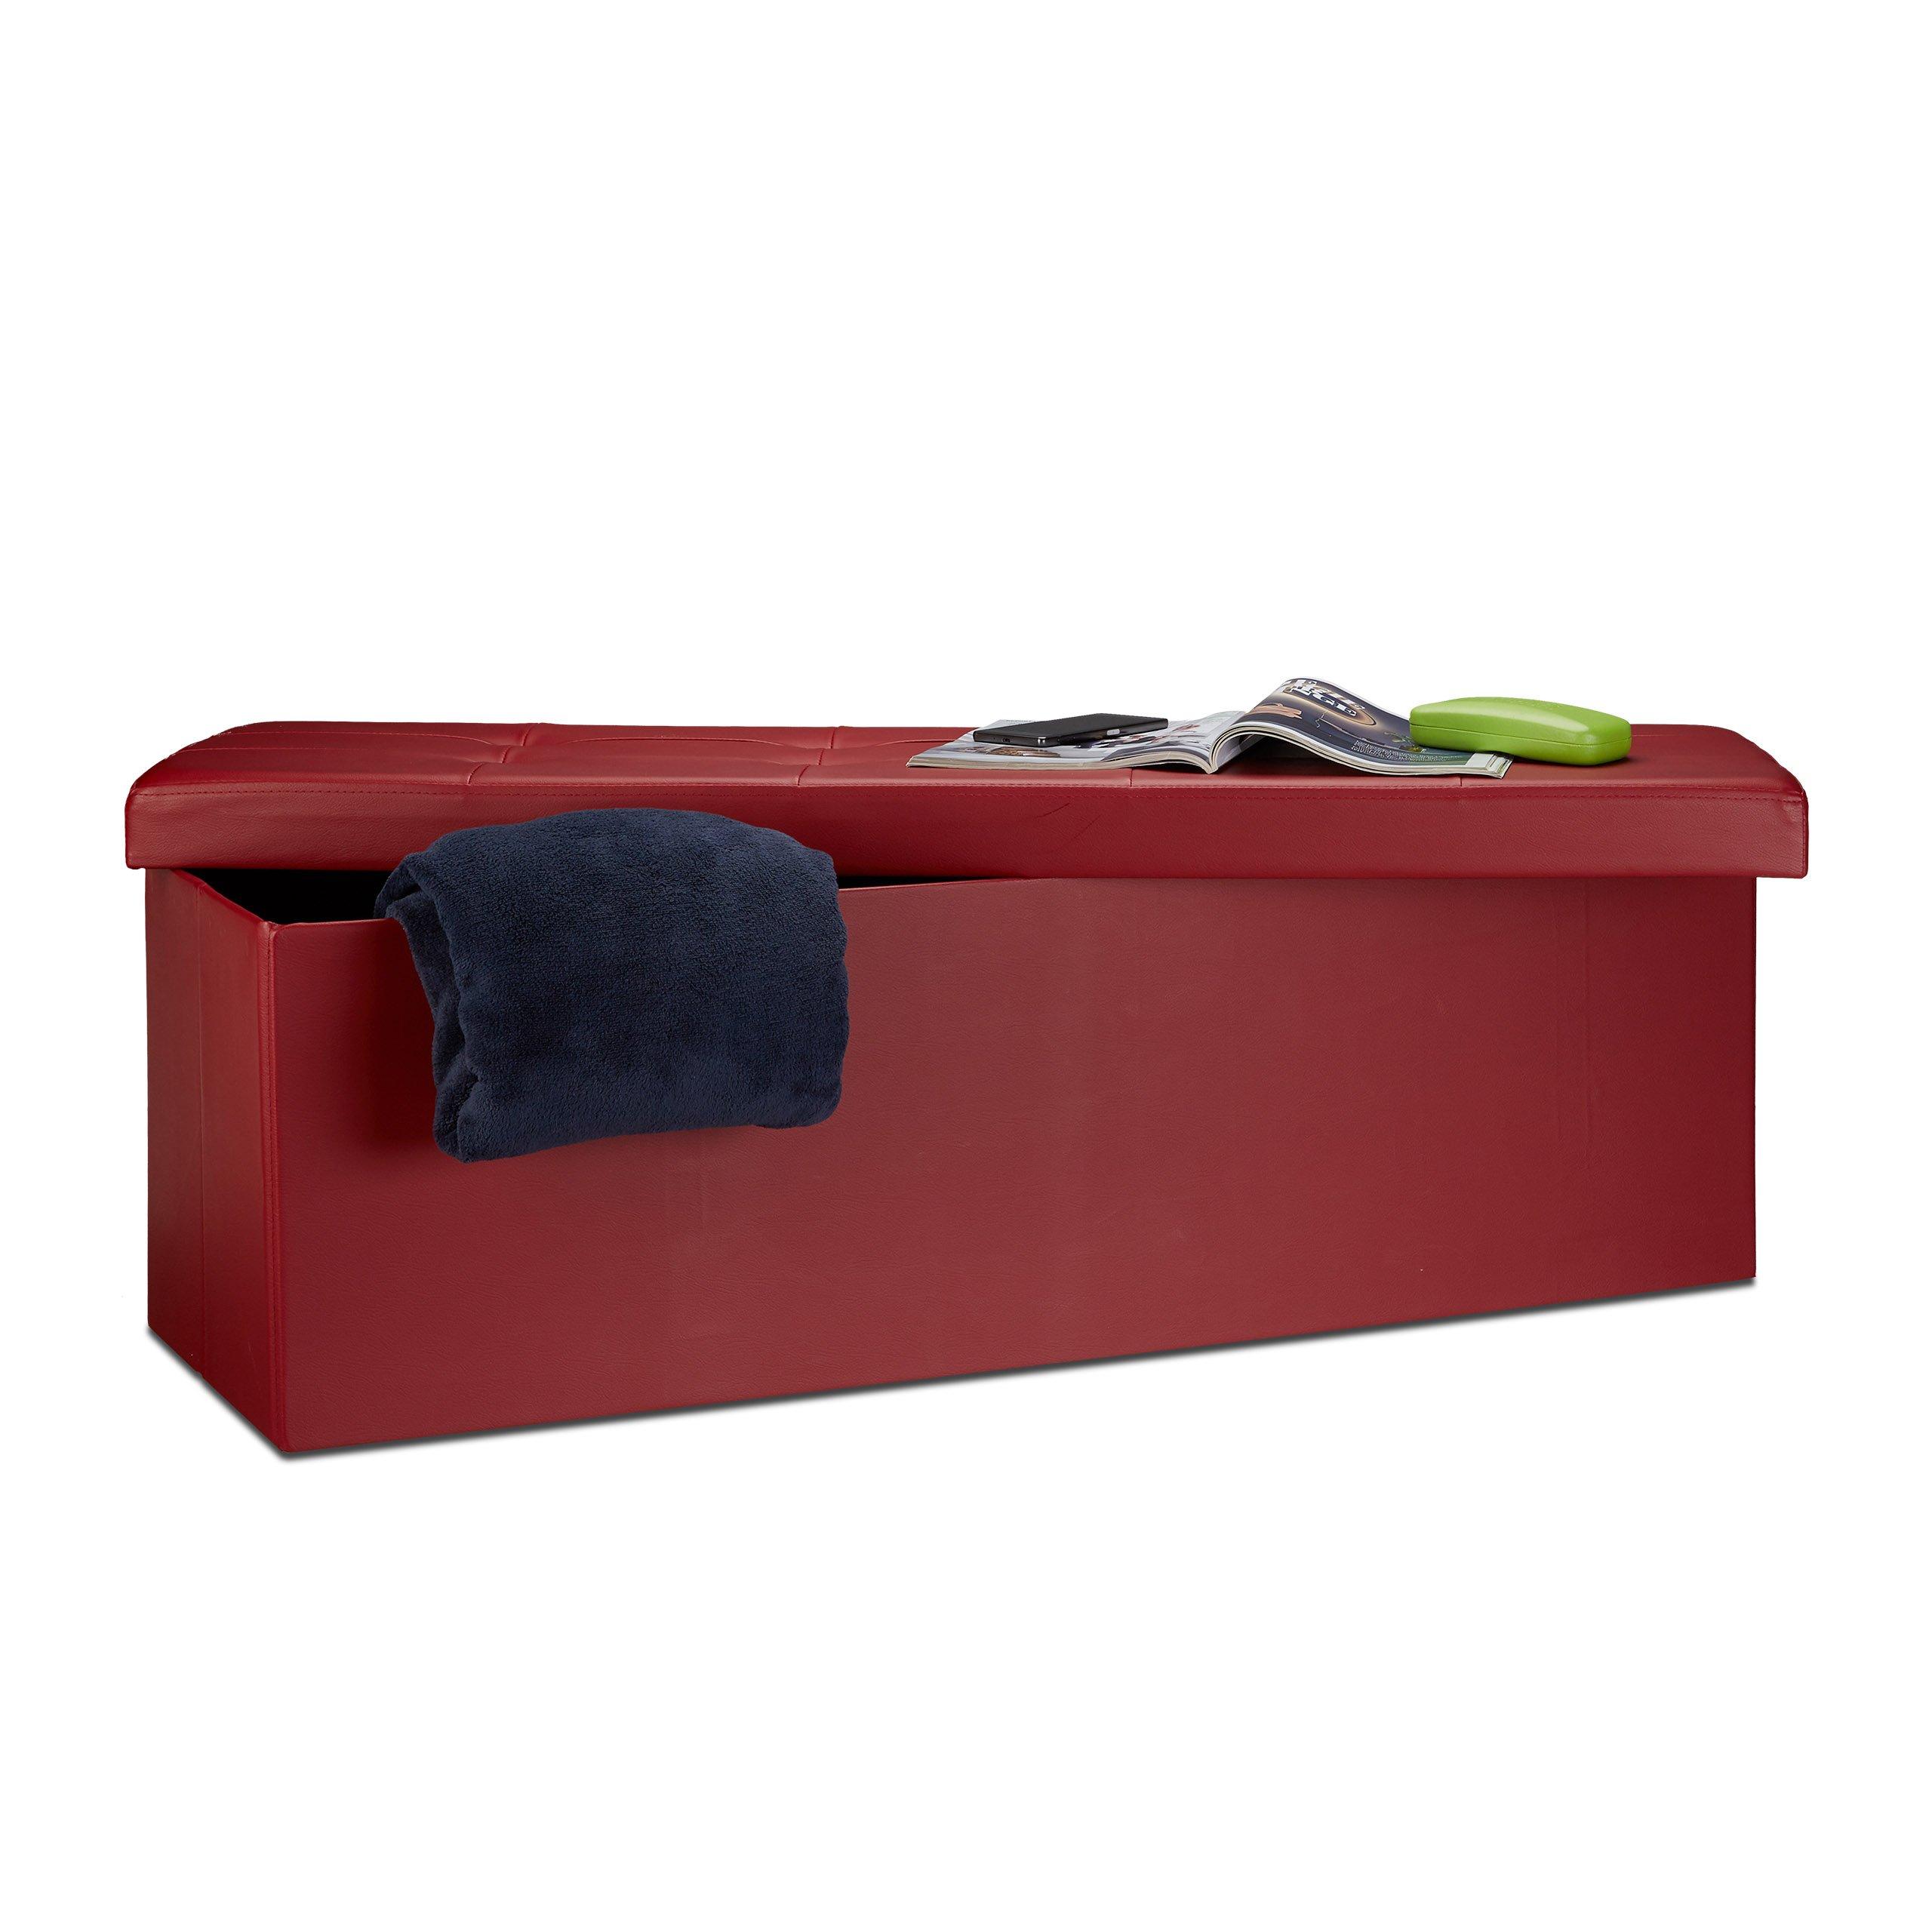 Relaxdays 10019045_708 Sgabello Pieghevole Cassapanca Pouf, Tessuto, Rosso Scuro, 114 x 38 x 38 cm, product image